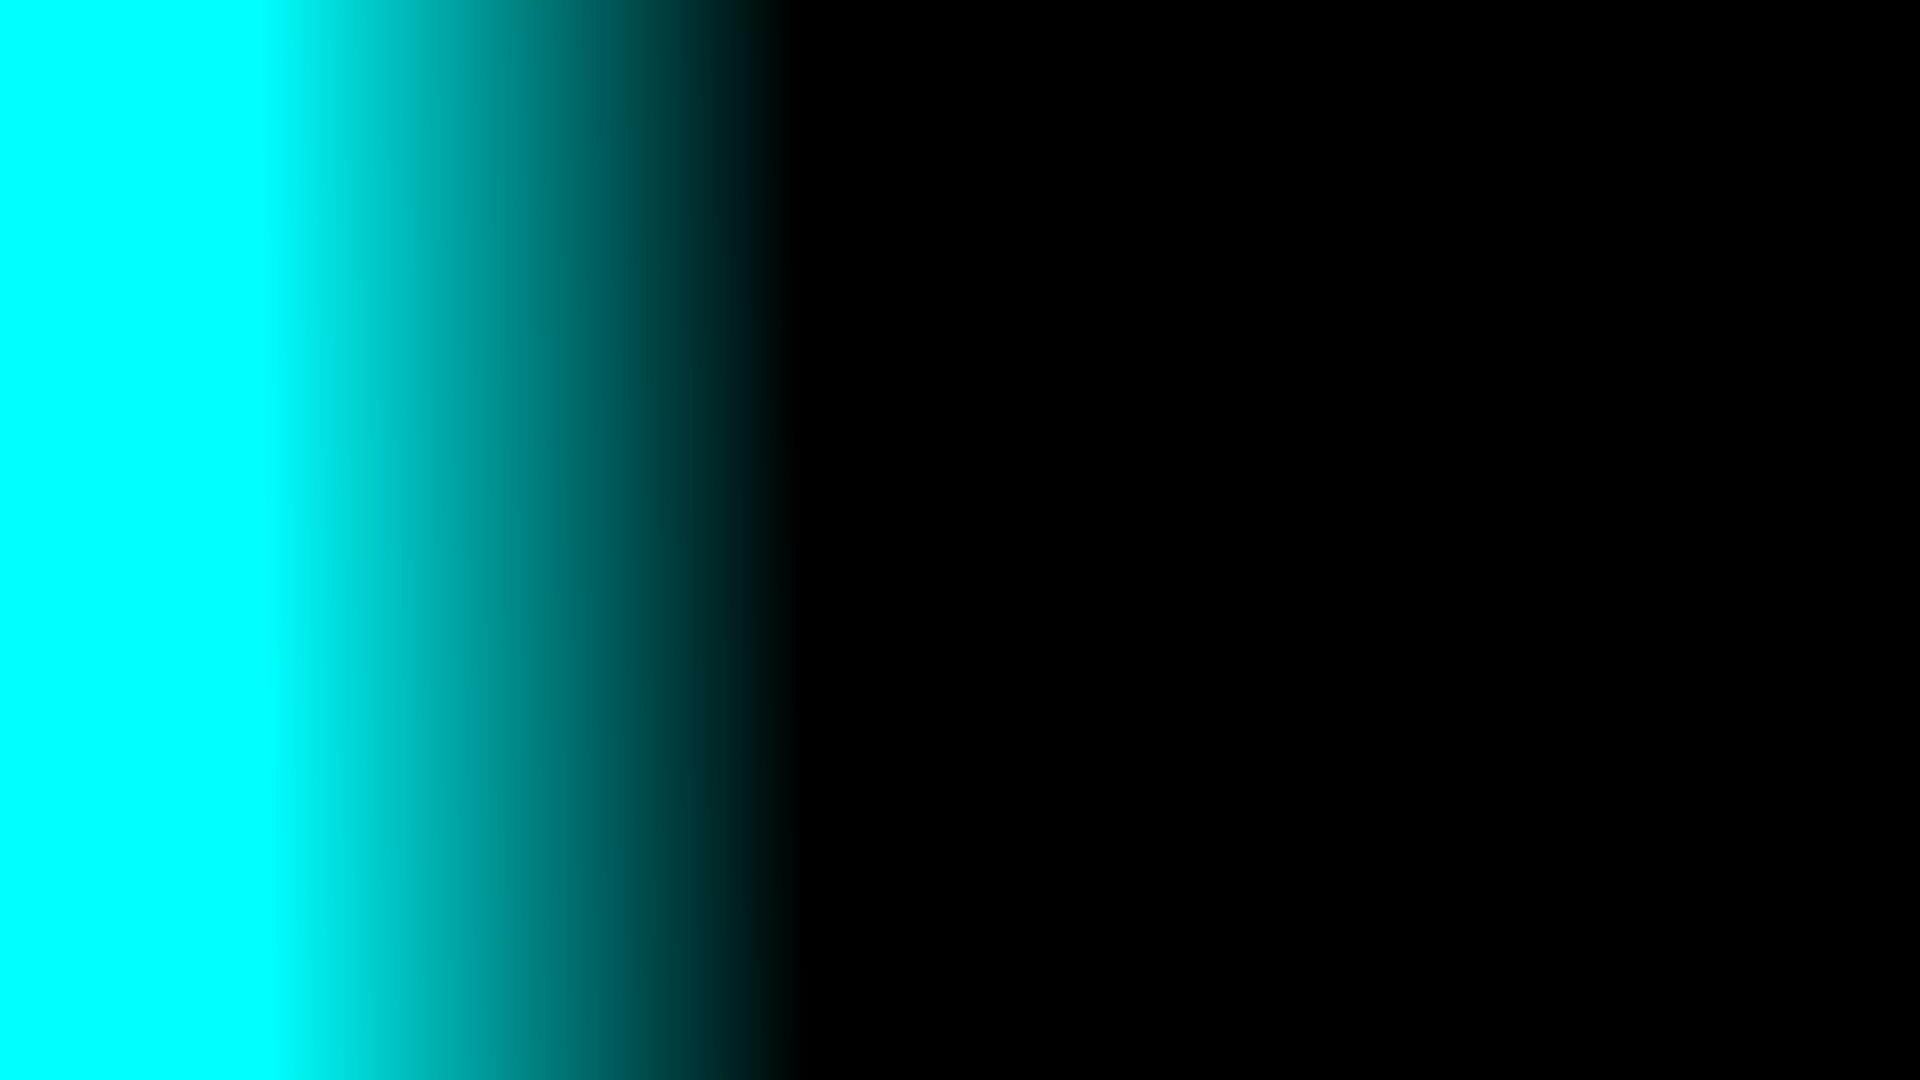 Nothing found for Light blue black gradient desktop wallpaper 1920x1080